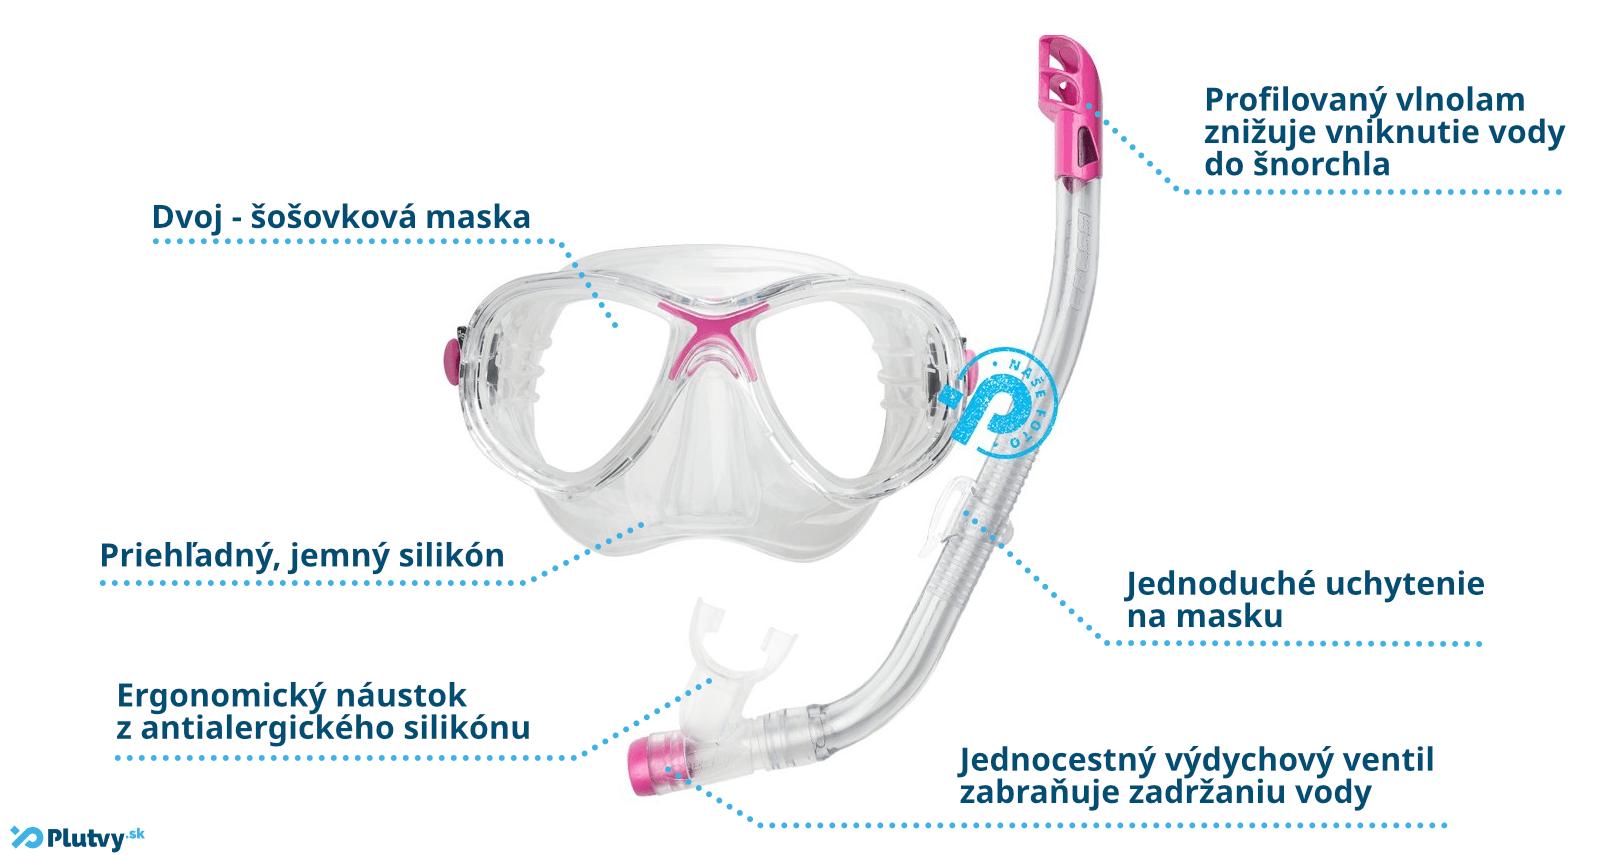 detsky-snorchlovaci-set-cressi-marea-dry-junior-plutvy-sk-2